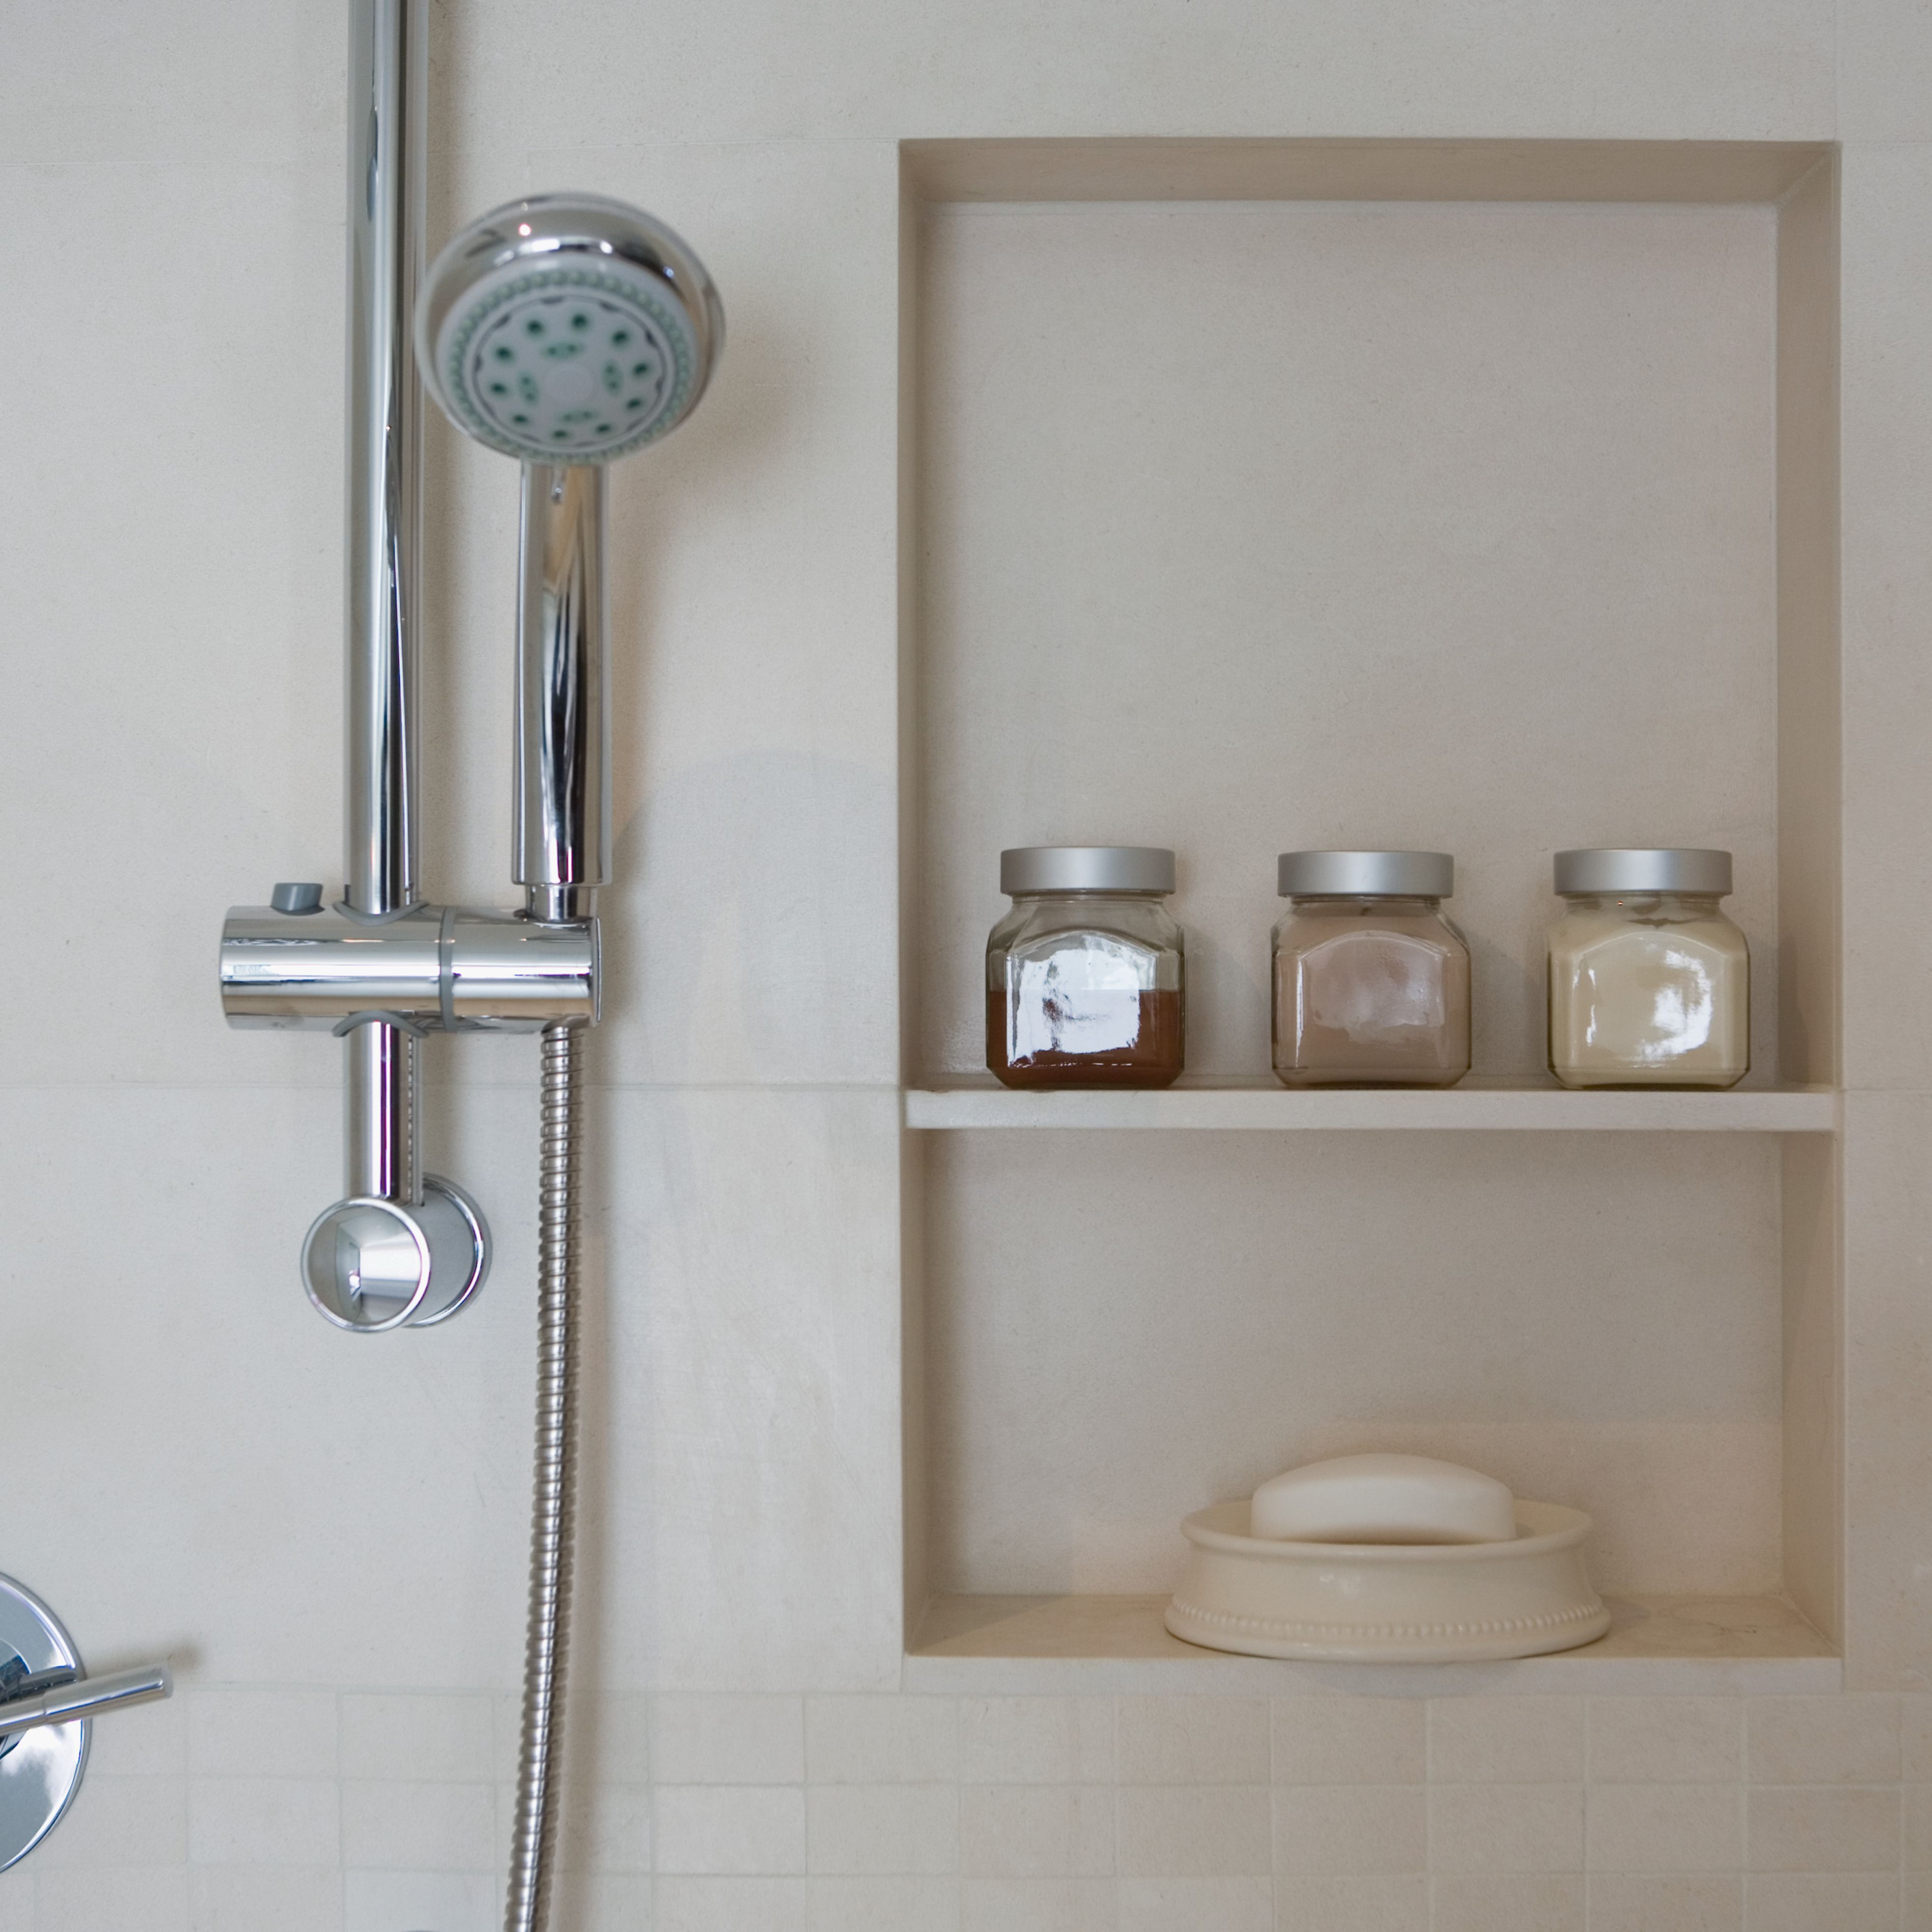 how to install a shower valve